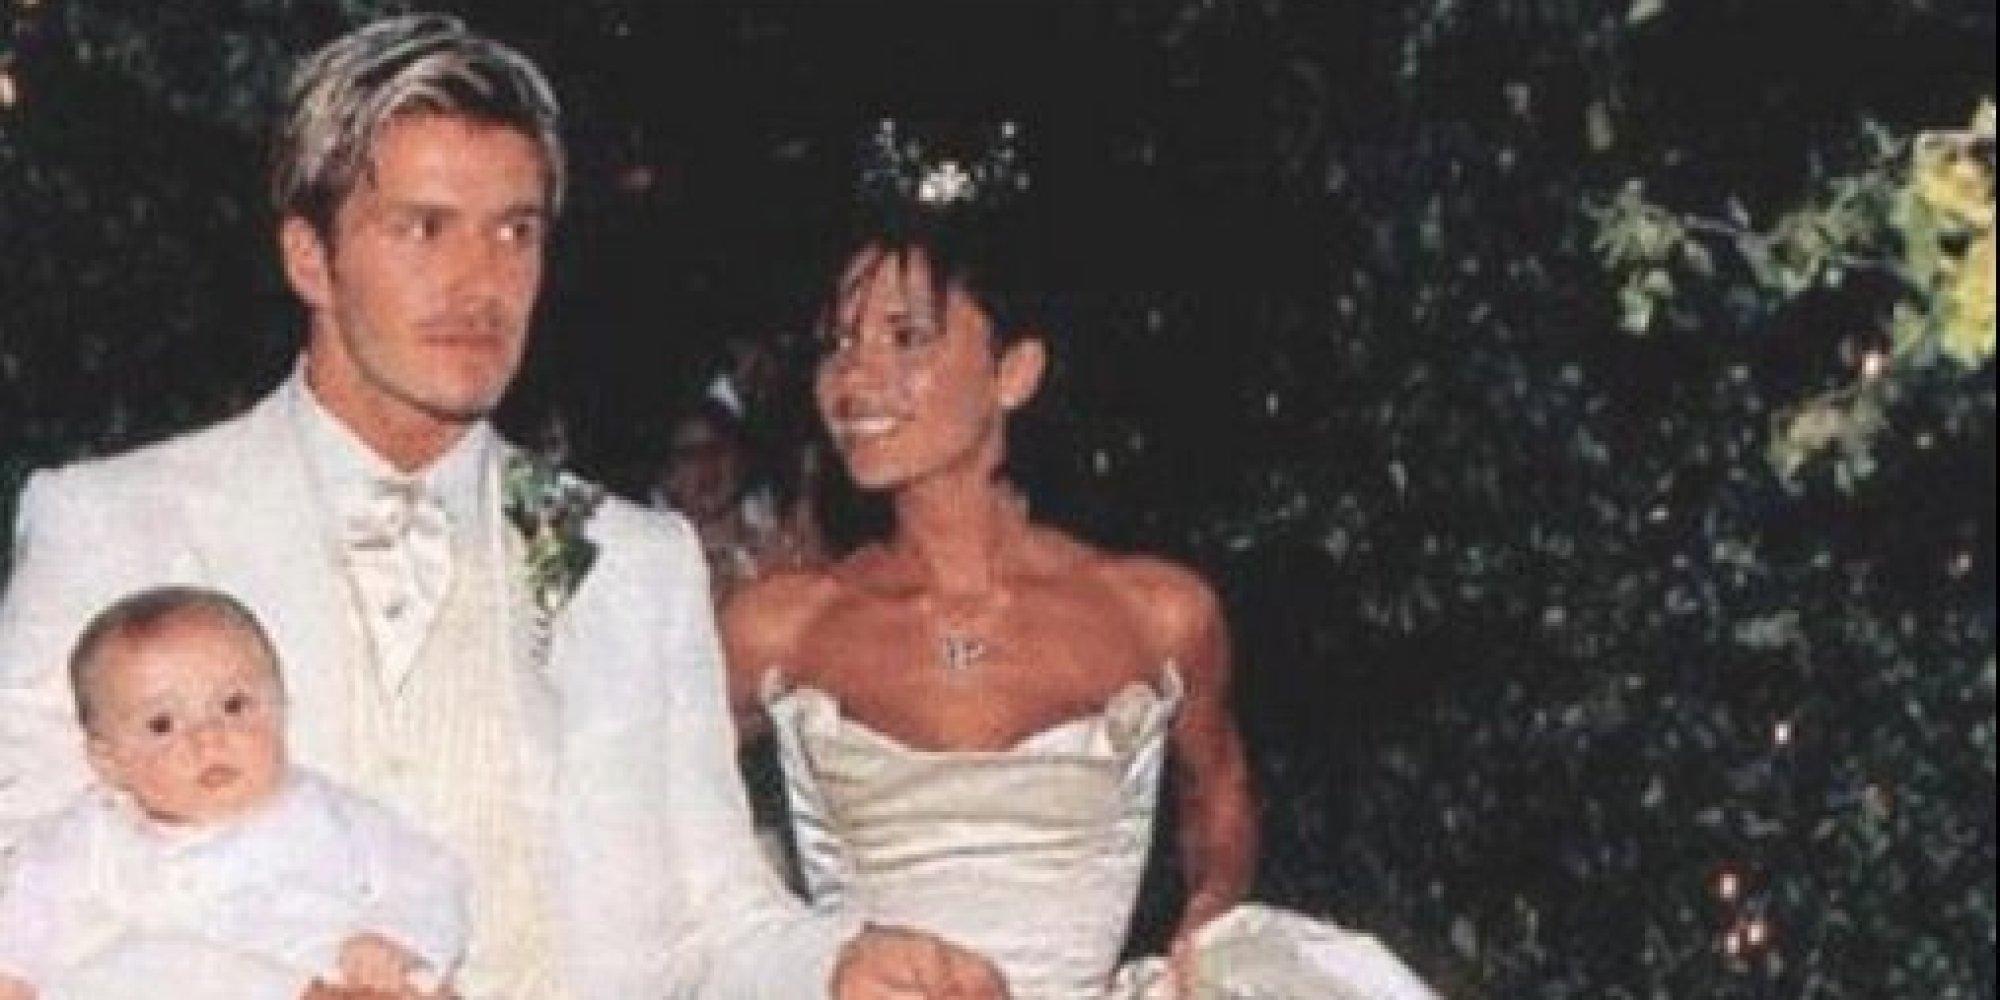 Victoria amp david beckham celebrate wedding anniversary like it s 1999